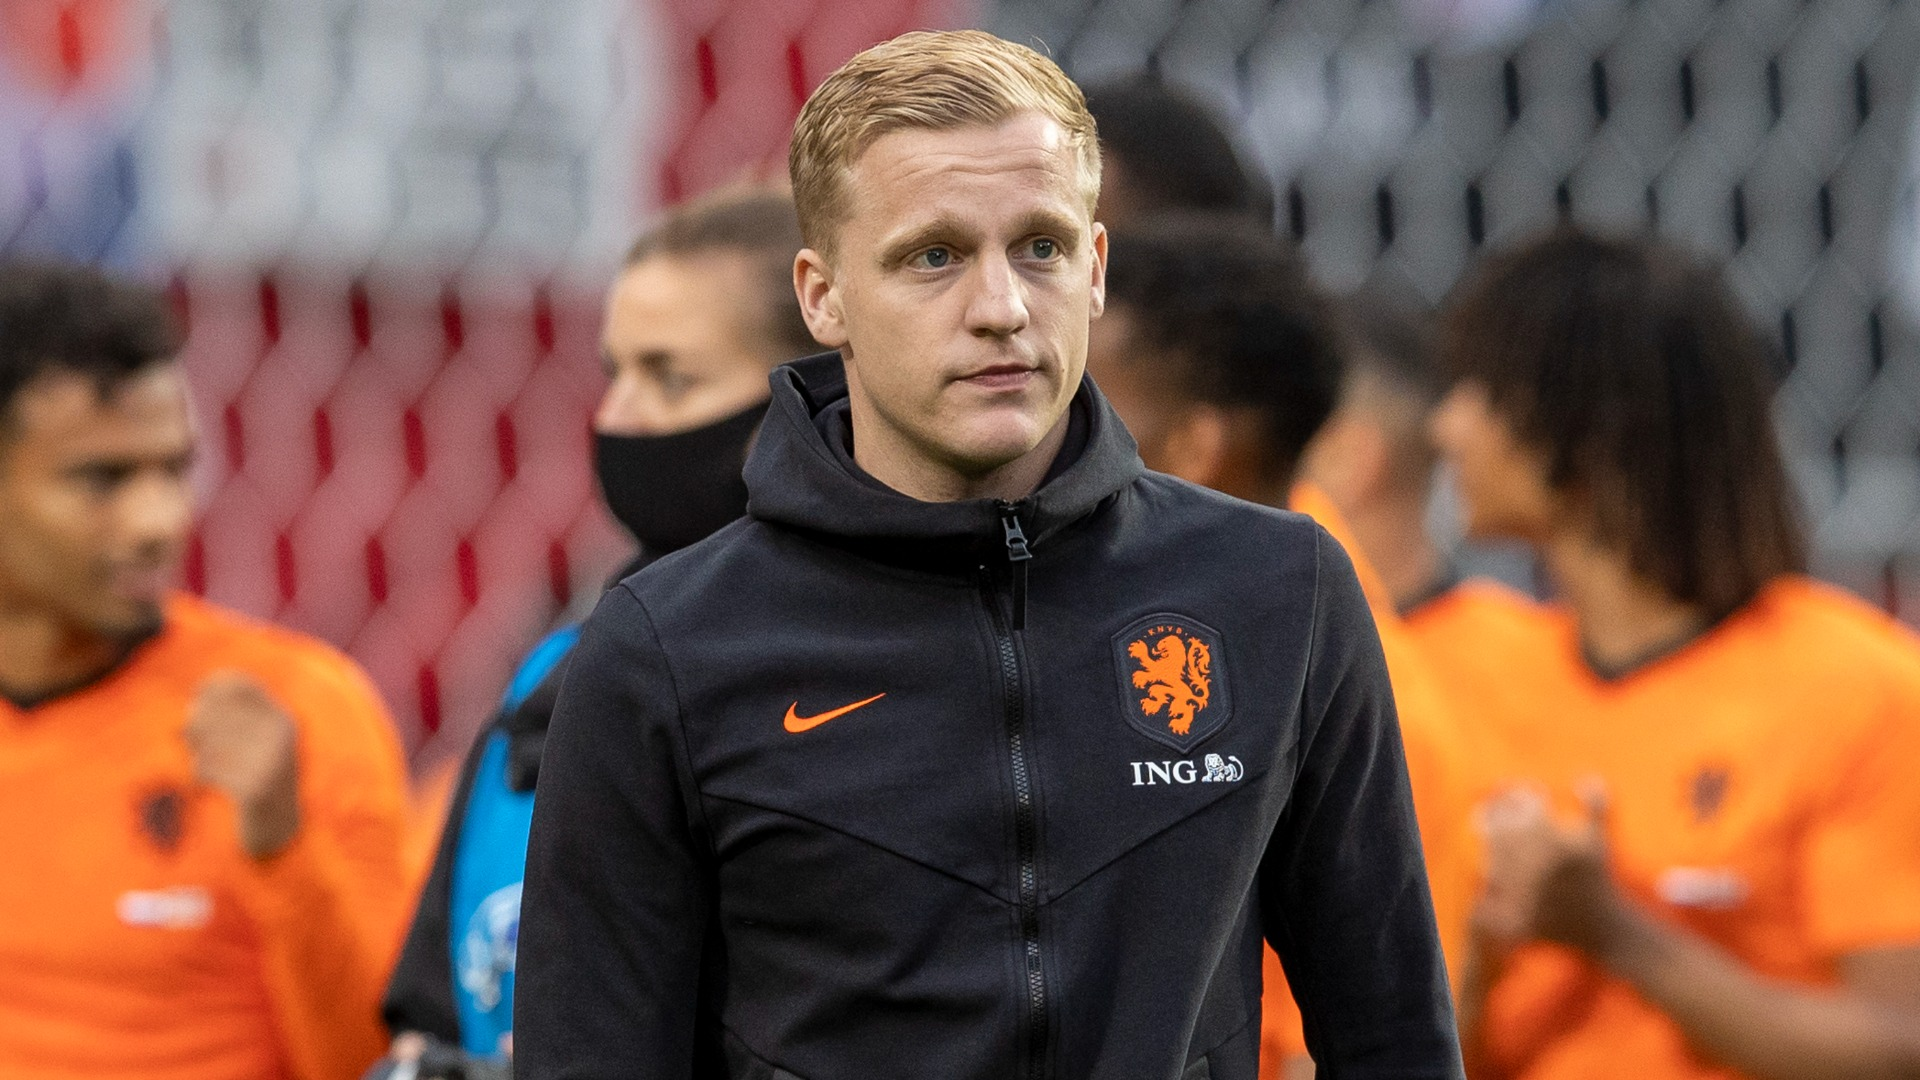 Luckless Netherlands midfielder Donny van de Beek will play no part in Euro 2020 due to an injury blow.